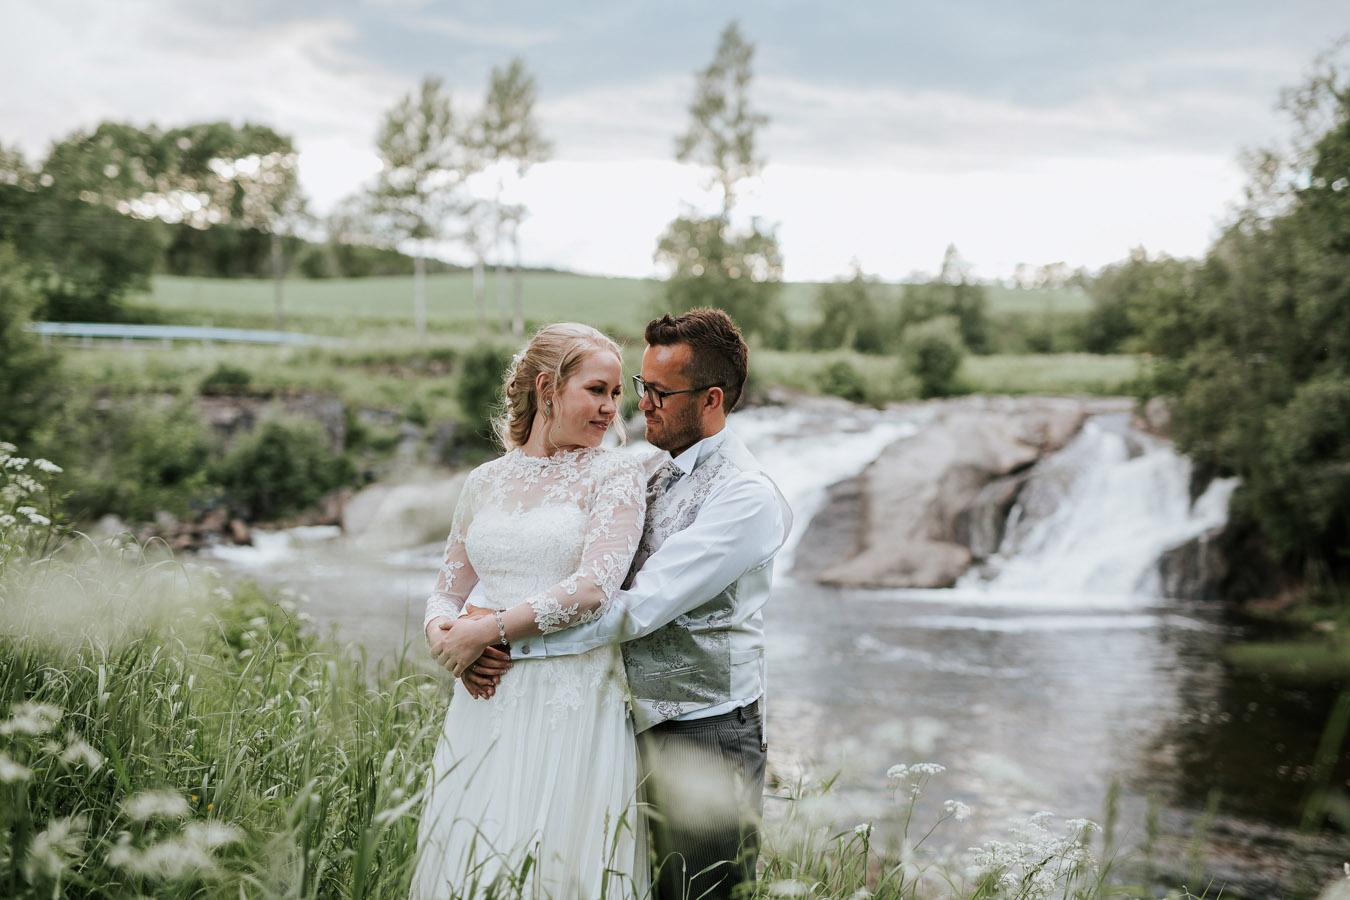 Fotograf-Tone-Tvedt-bryllup-190.jpg